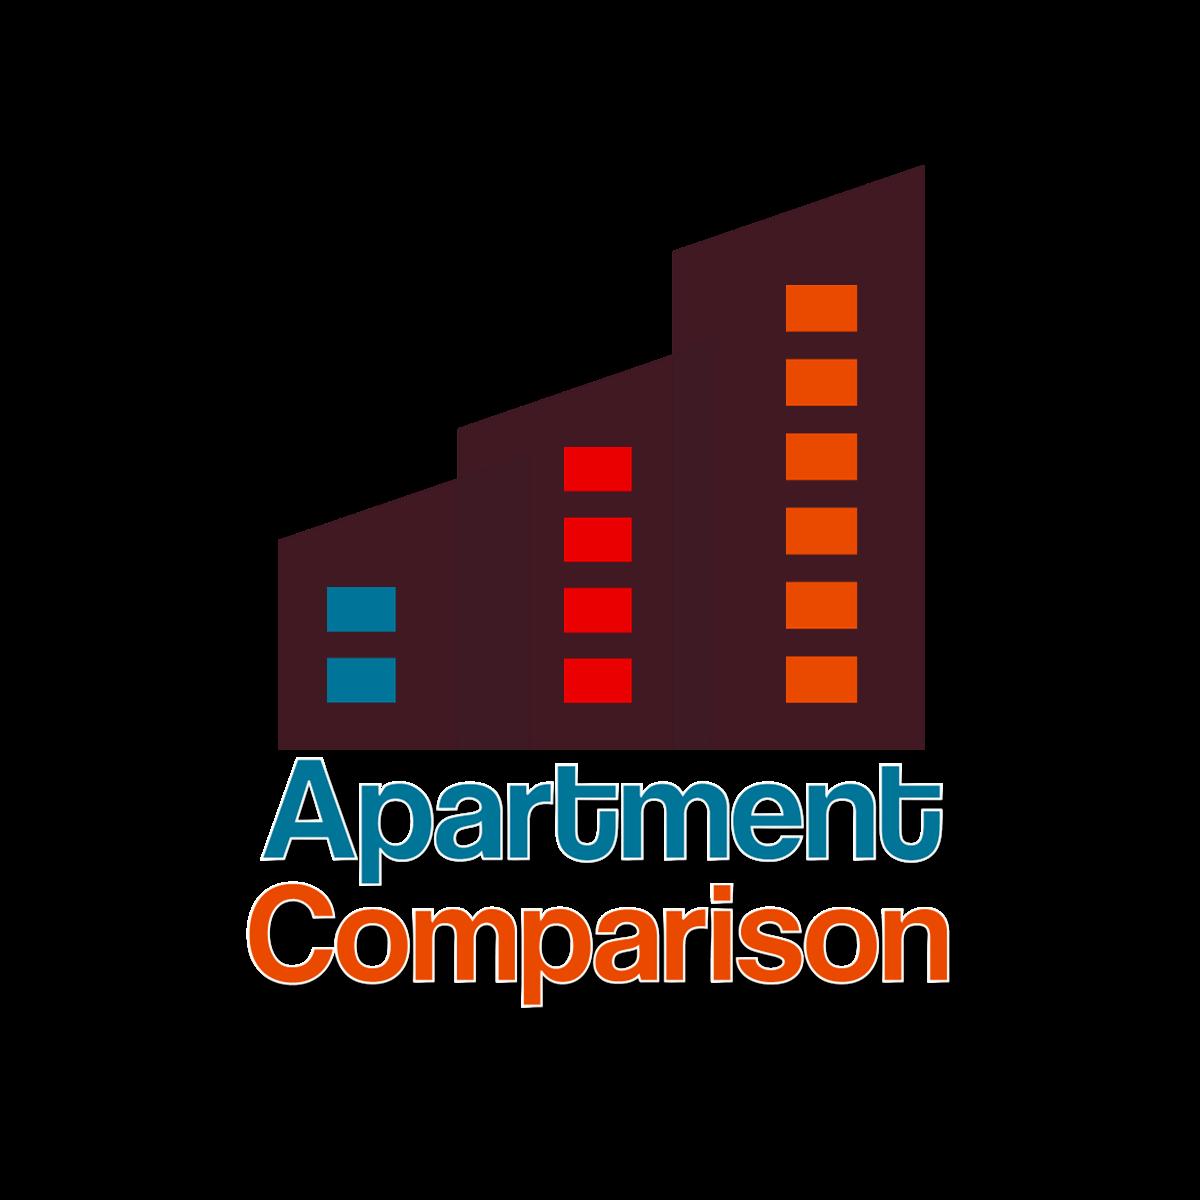 Excel Spreadsheets Help Apartment Comparison Spreadsheet